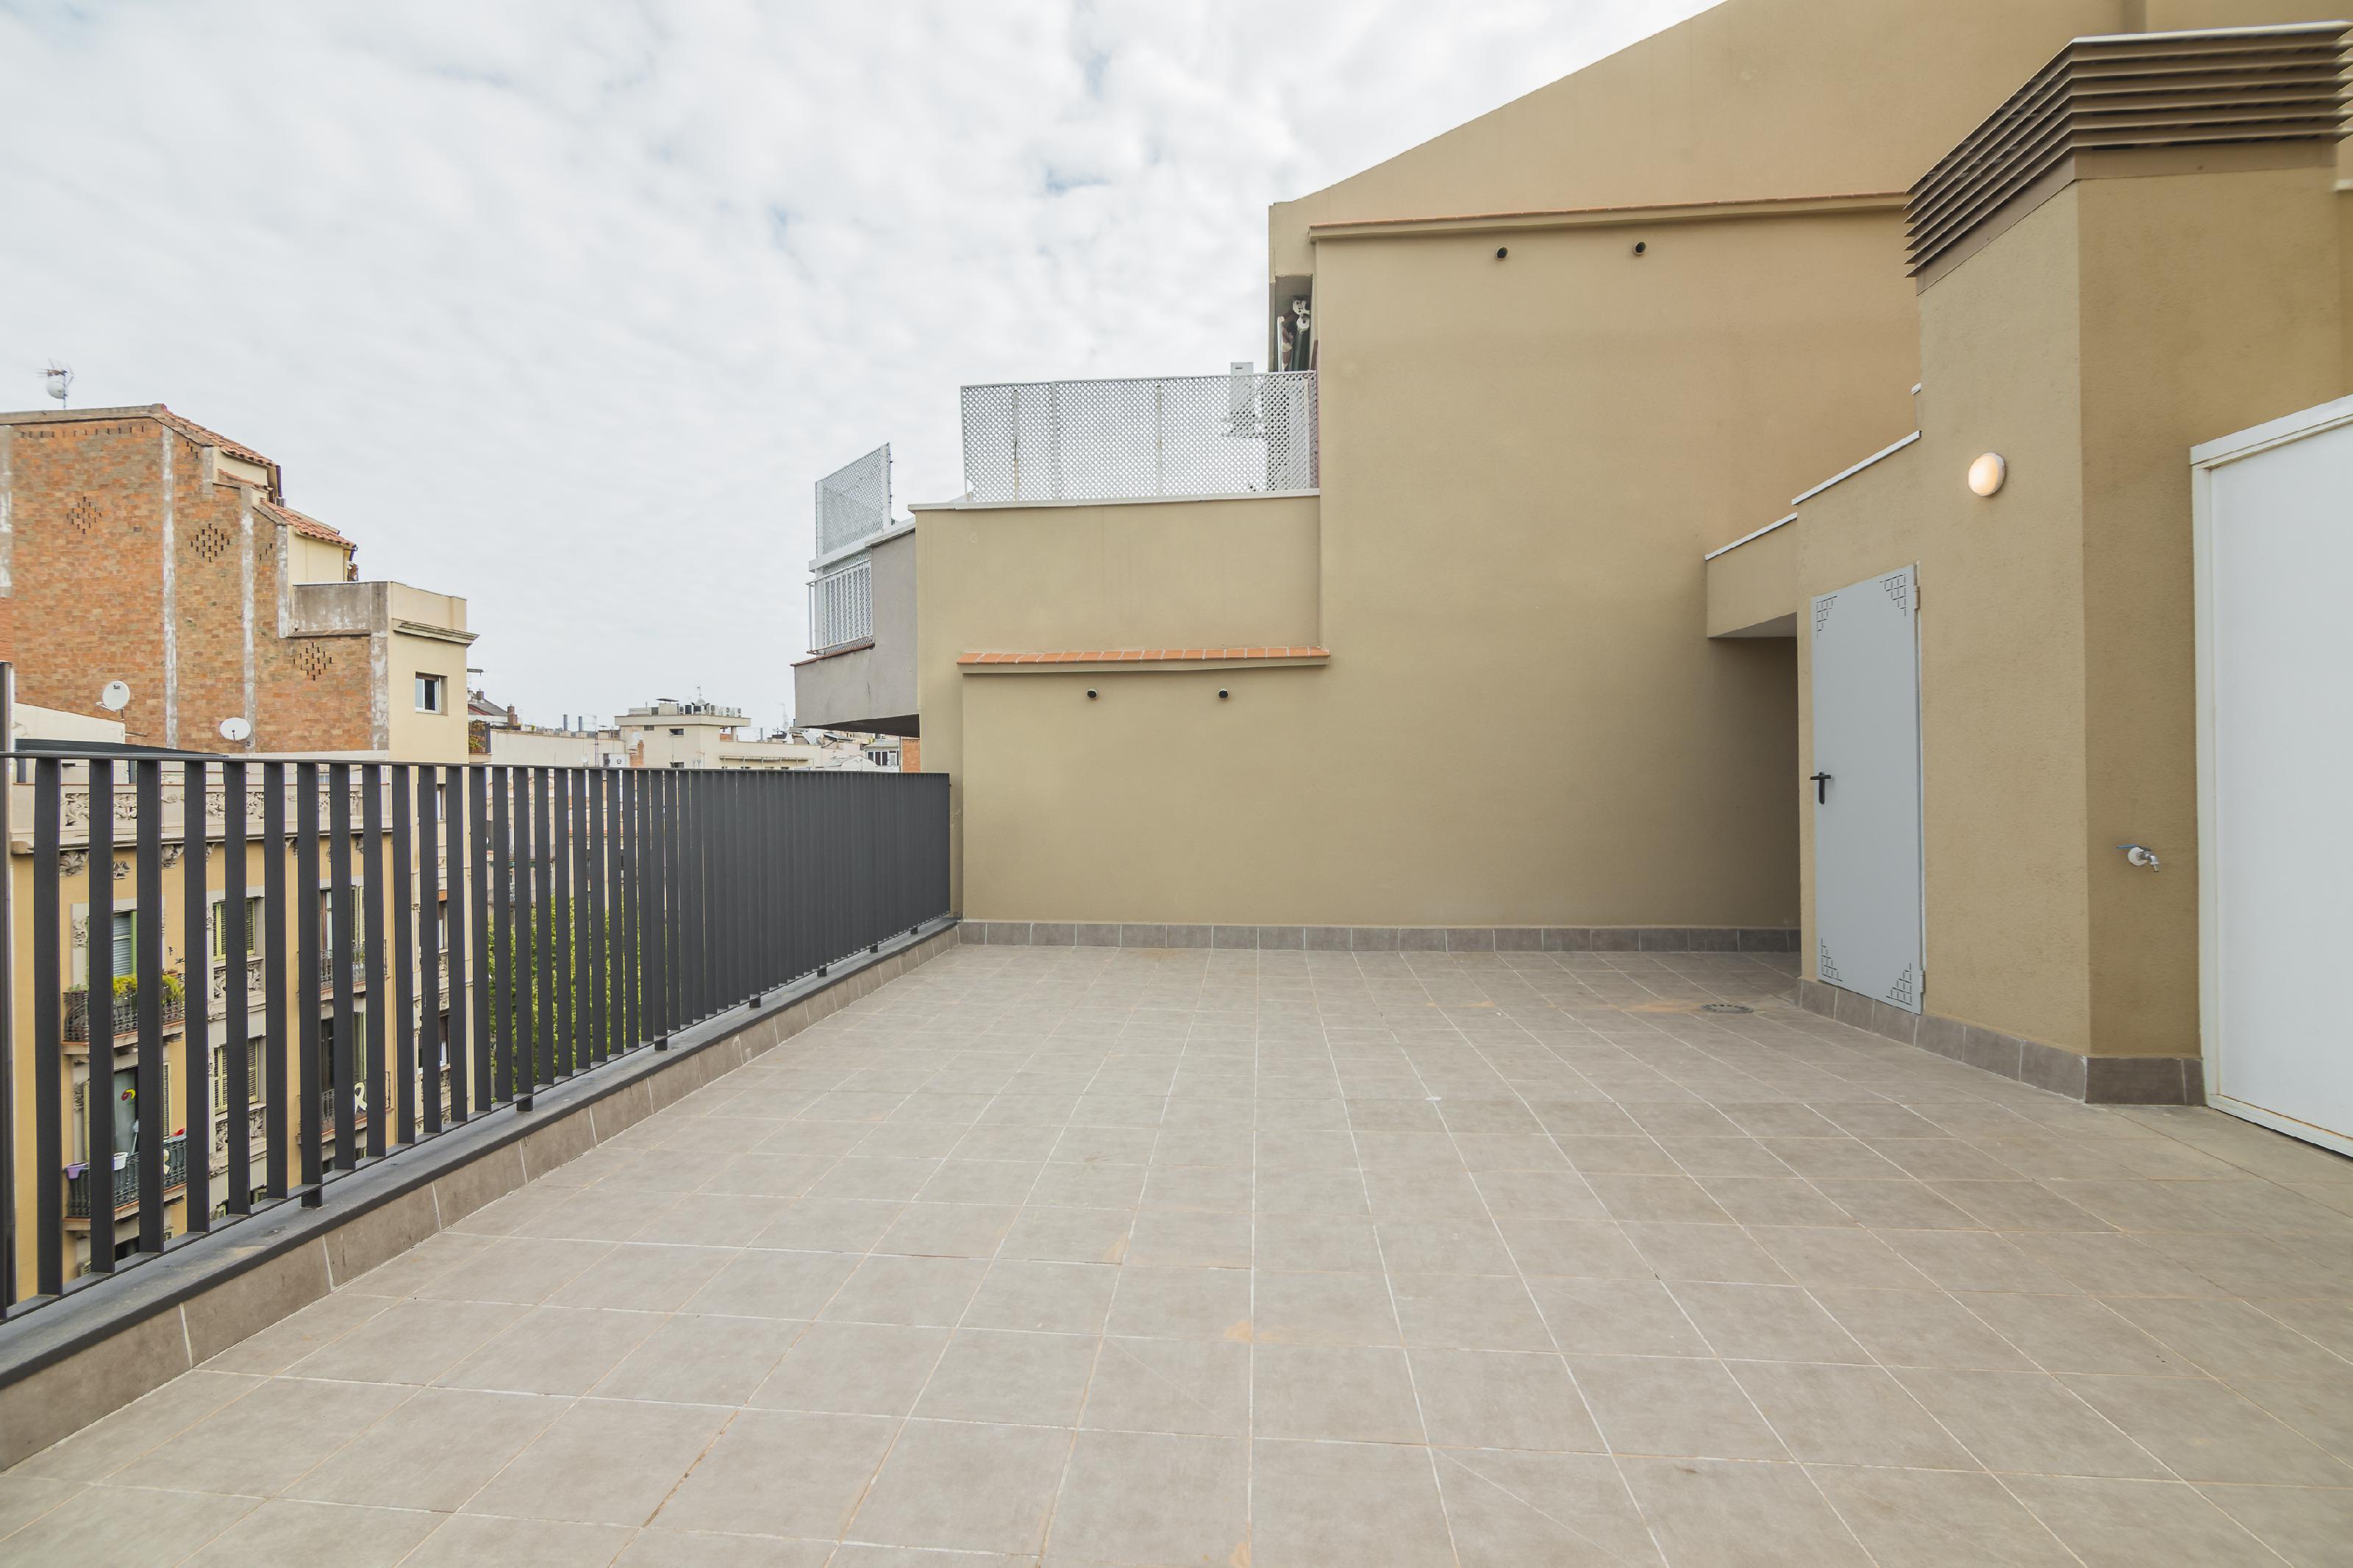 249267 Flat for sale in Eixample, Nova Esquerra Eixample 6